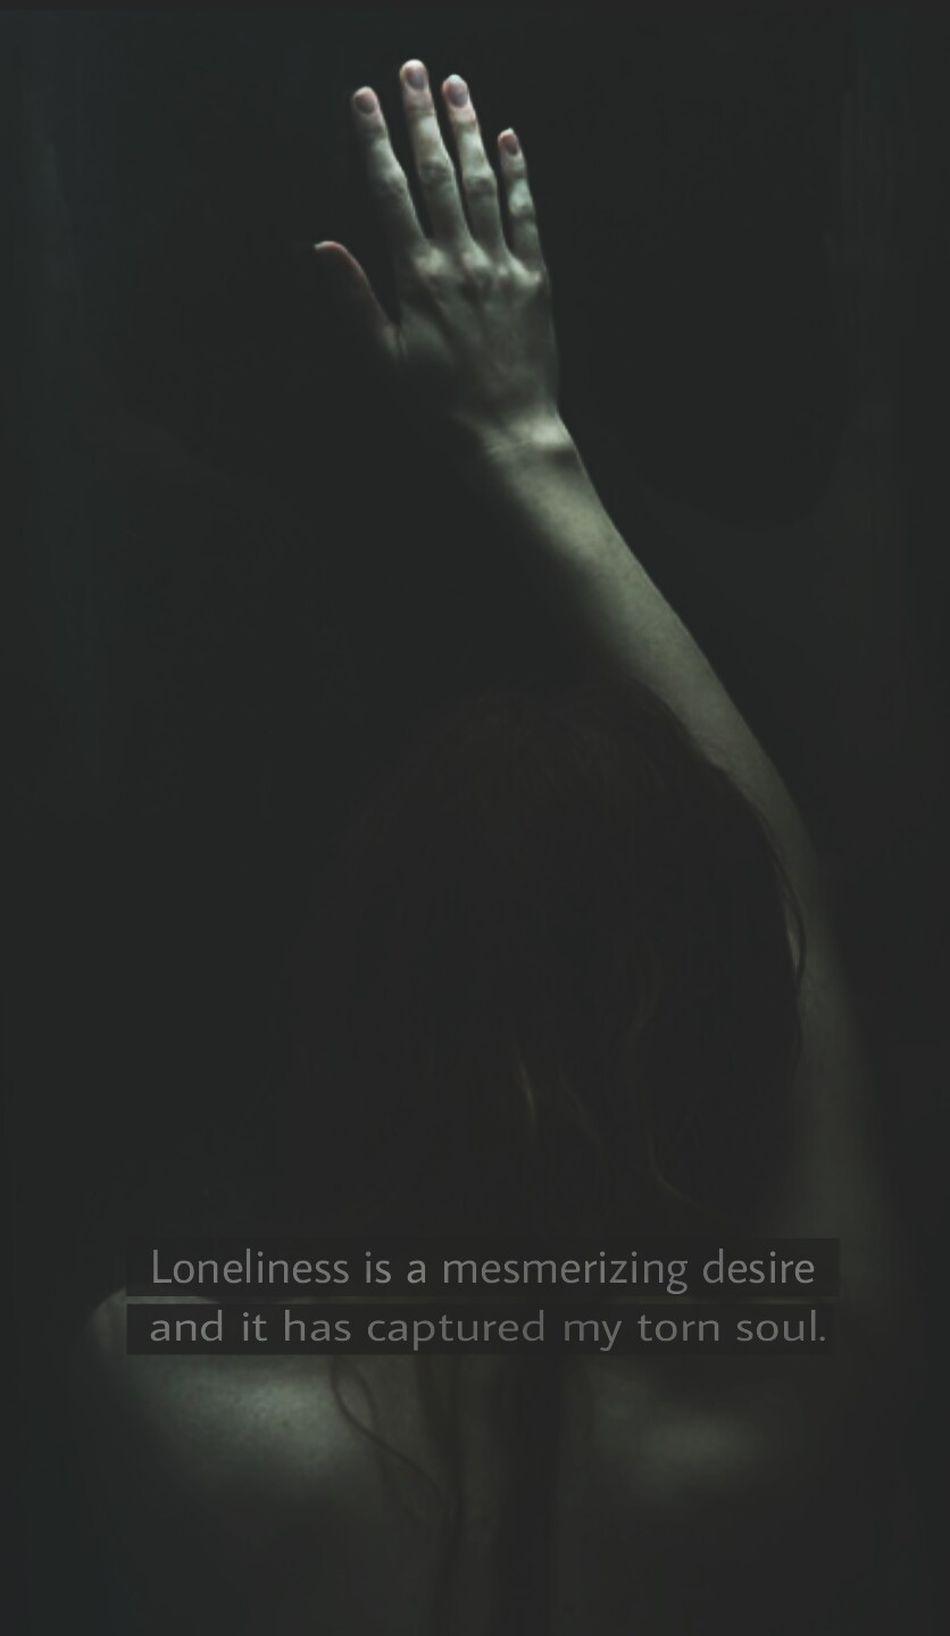 ig GORGEOUS.CHUCK Darkness And Light Sadpoetry Black Lostplaces Memories Feelinglost Loneliness Lost Lonelymountain Blackandwhite Brokensoul Darkthoughts B&w Darkpath UrduPoetry Proartists